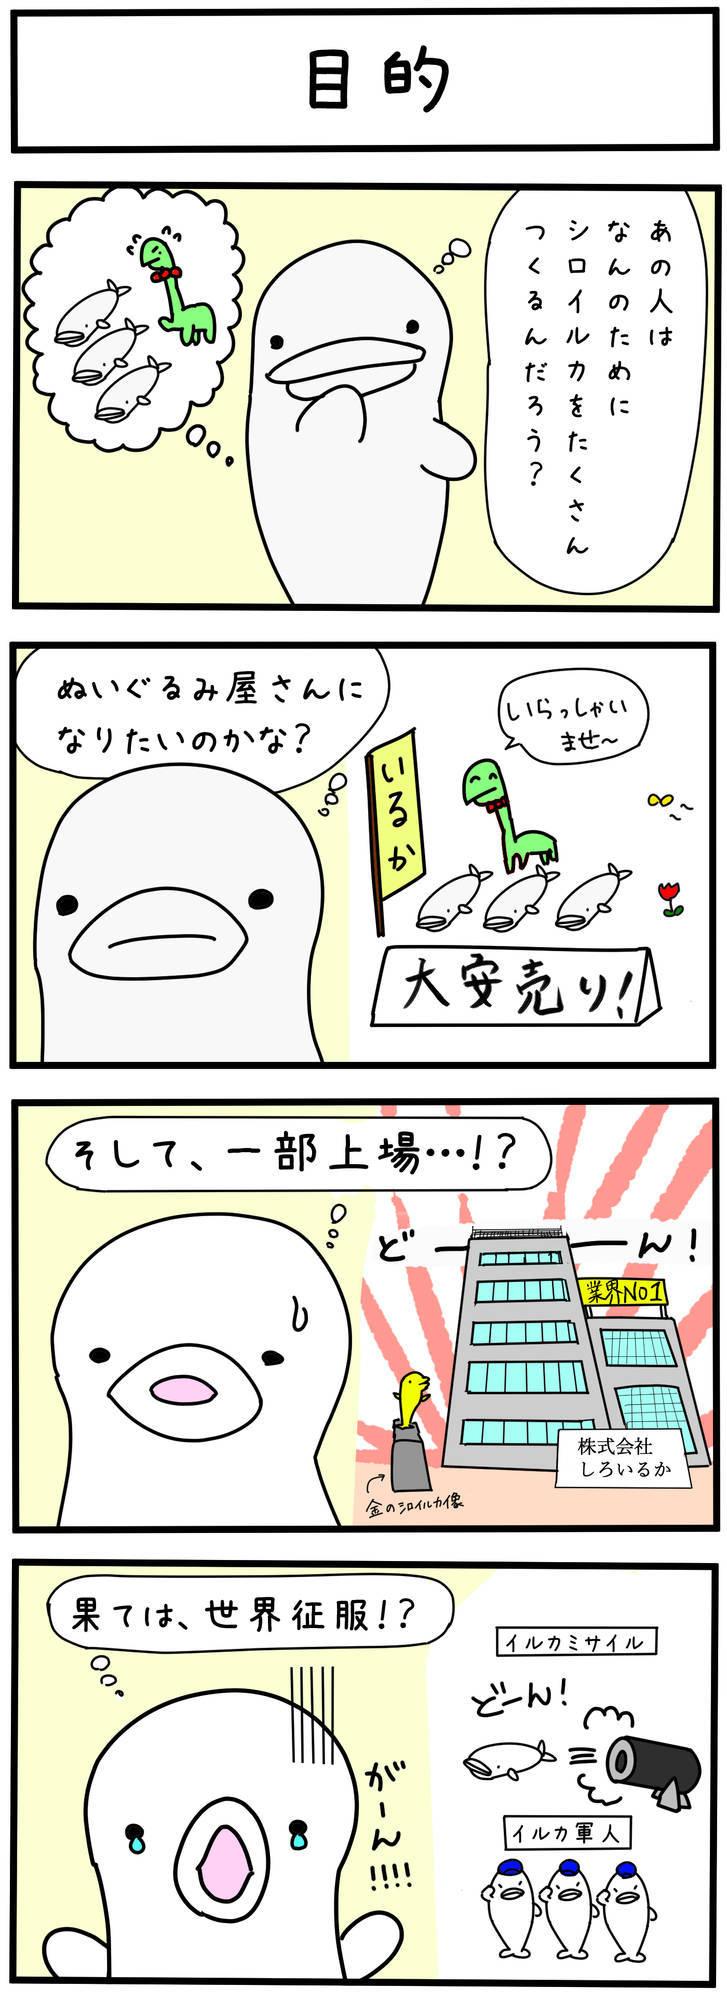 f:id:shiro_iruka:20190316205017j:plain